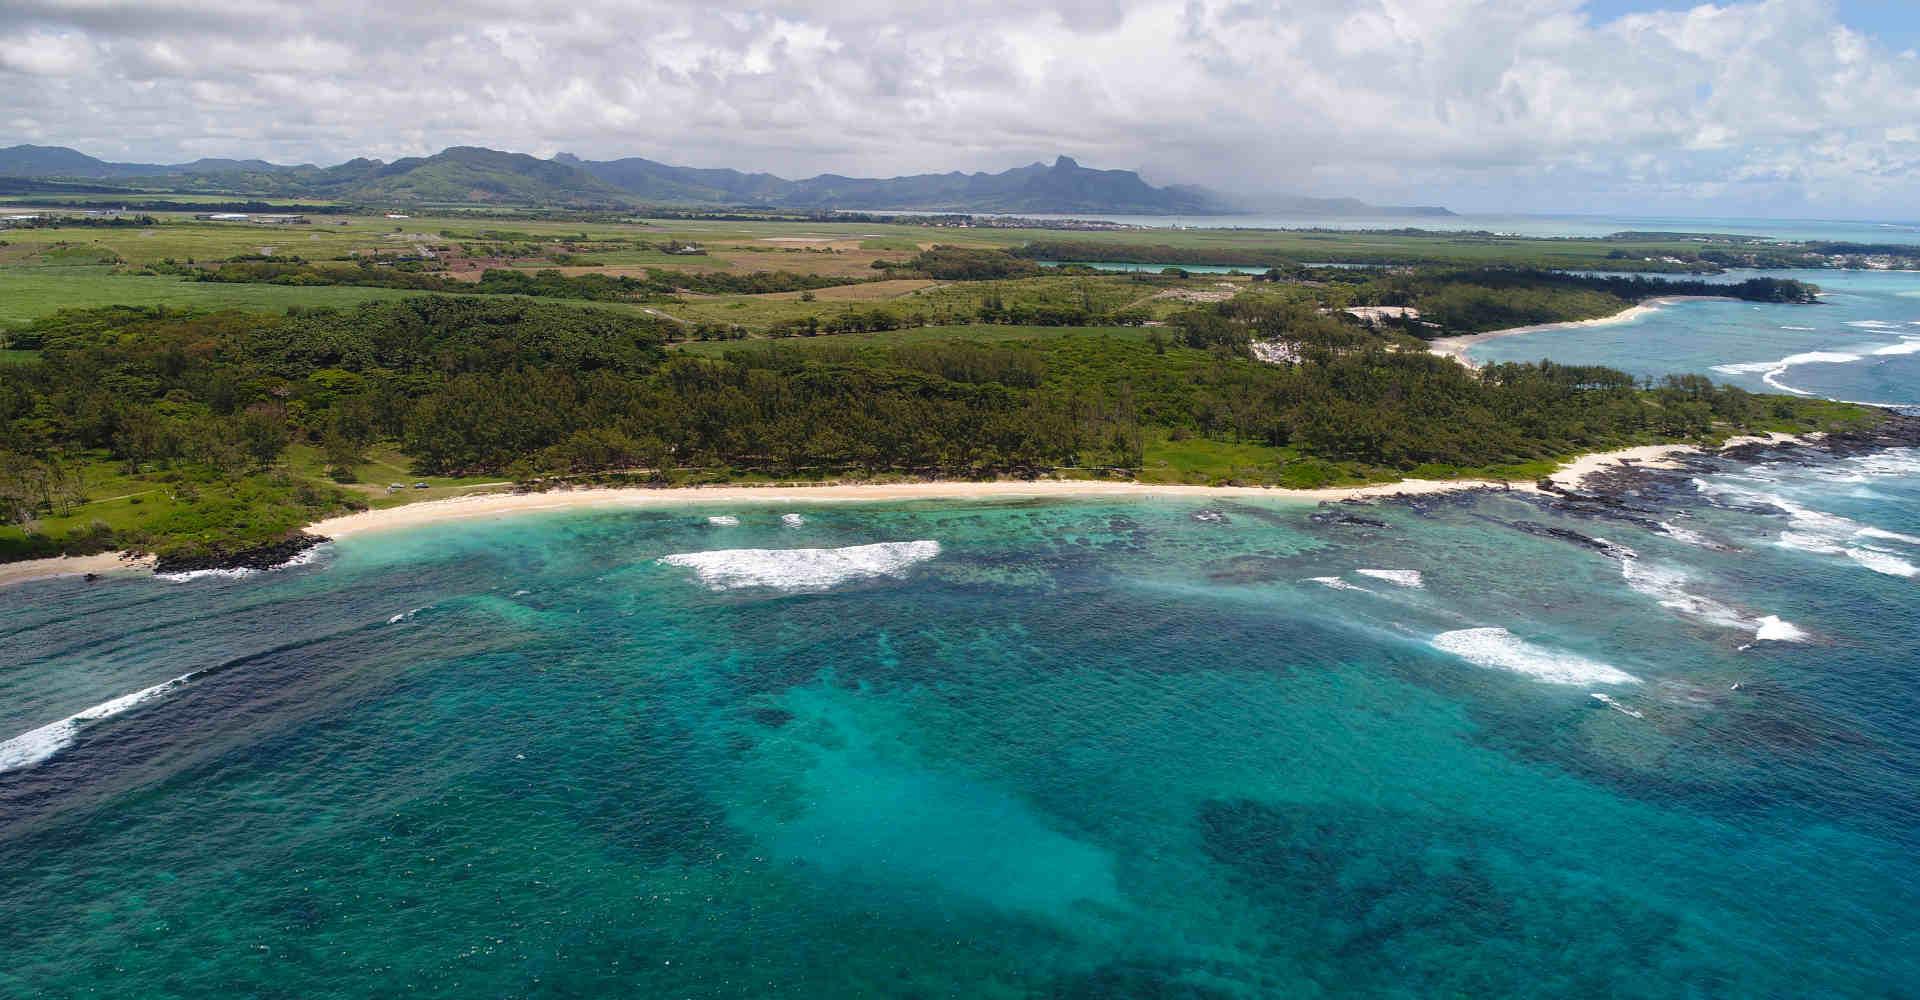 La Cambuse beach in the south of Mauritius